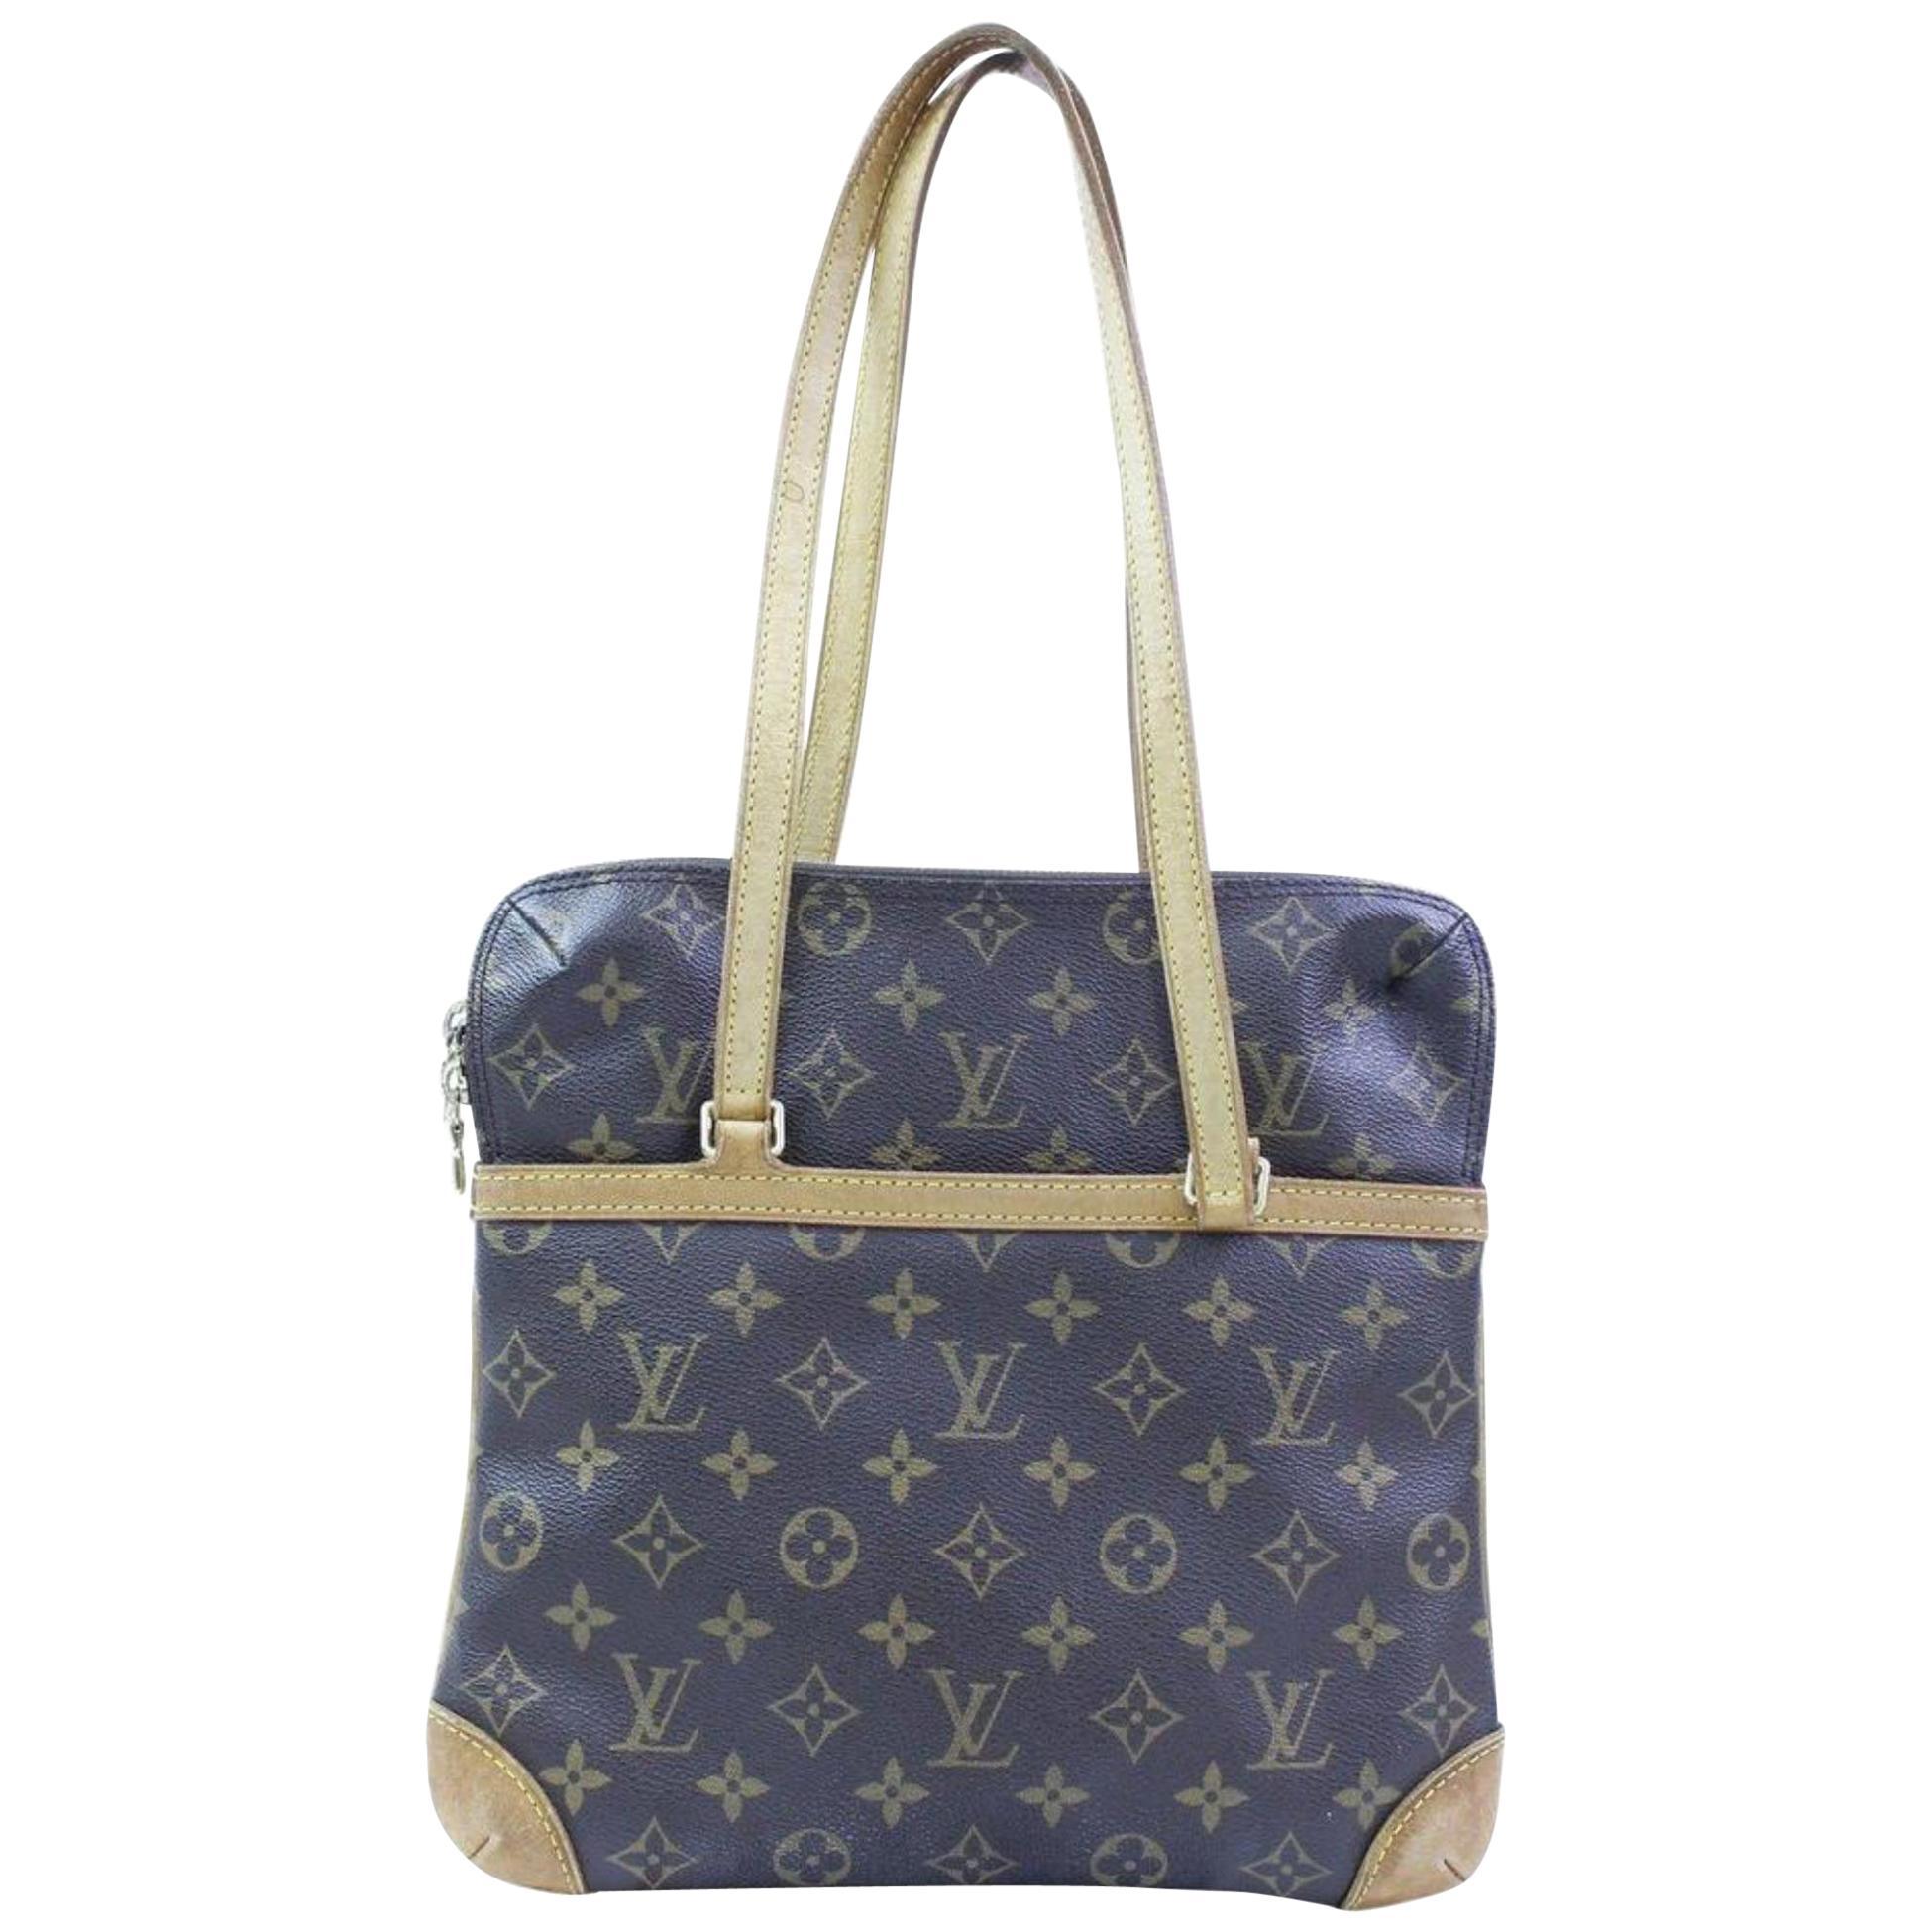 b4c21ab1b7da Vintage Louis Vuitton Shoulder Bags - 945 For Sale at 1stdibs